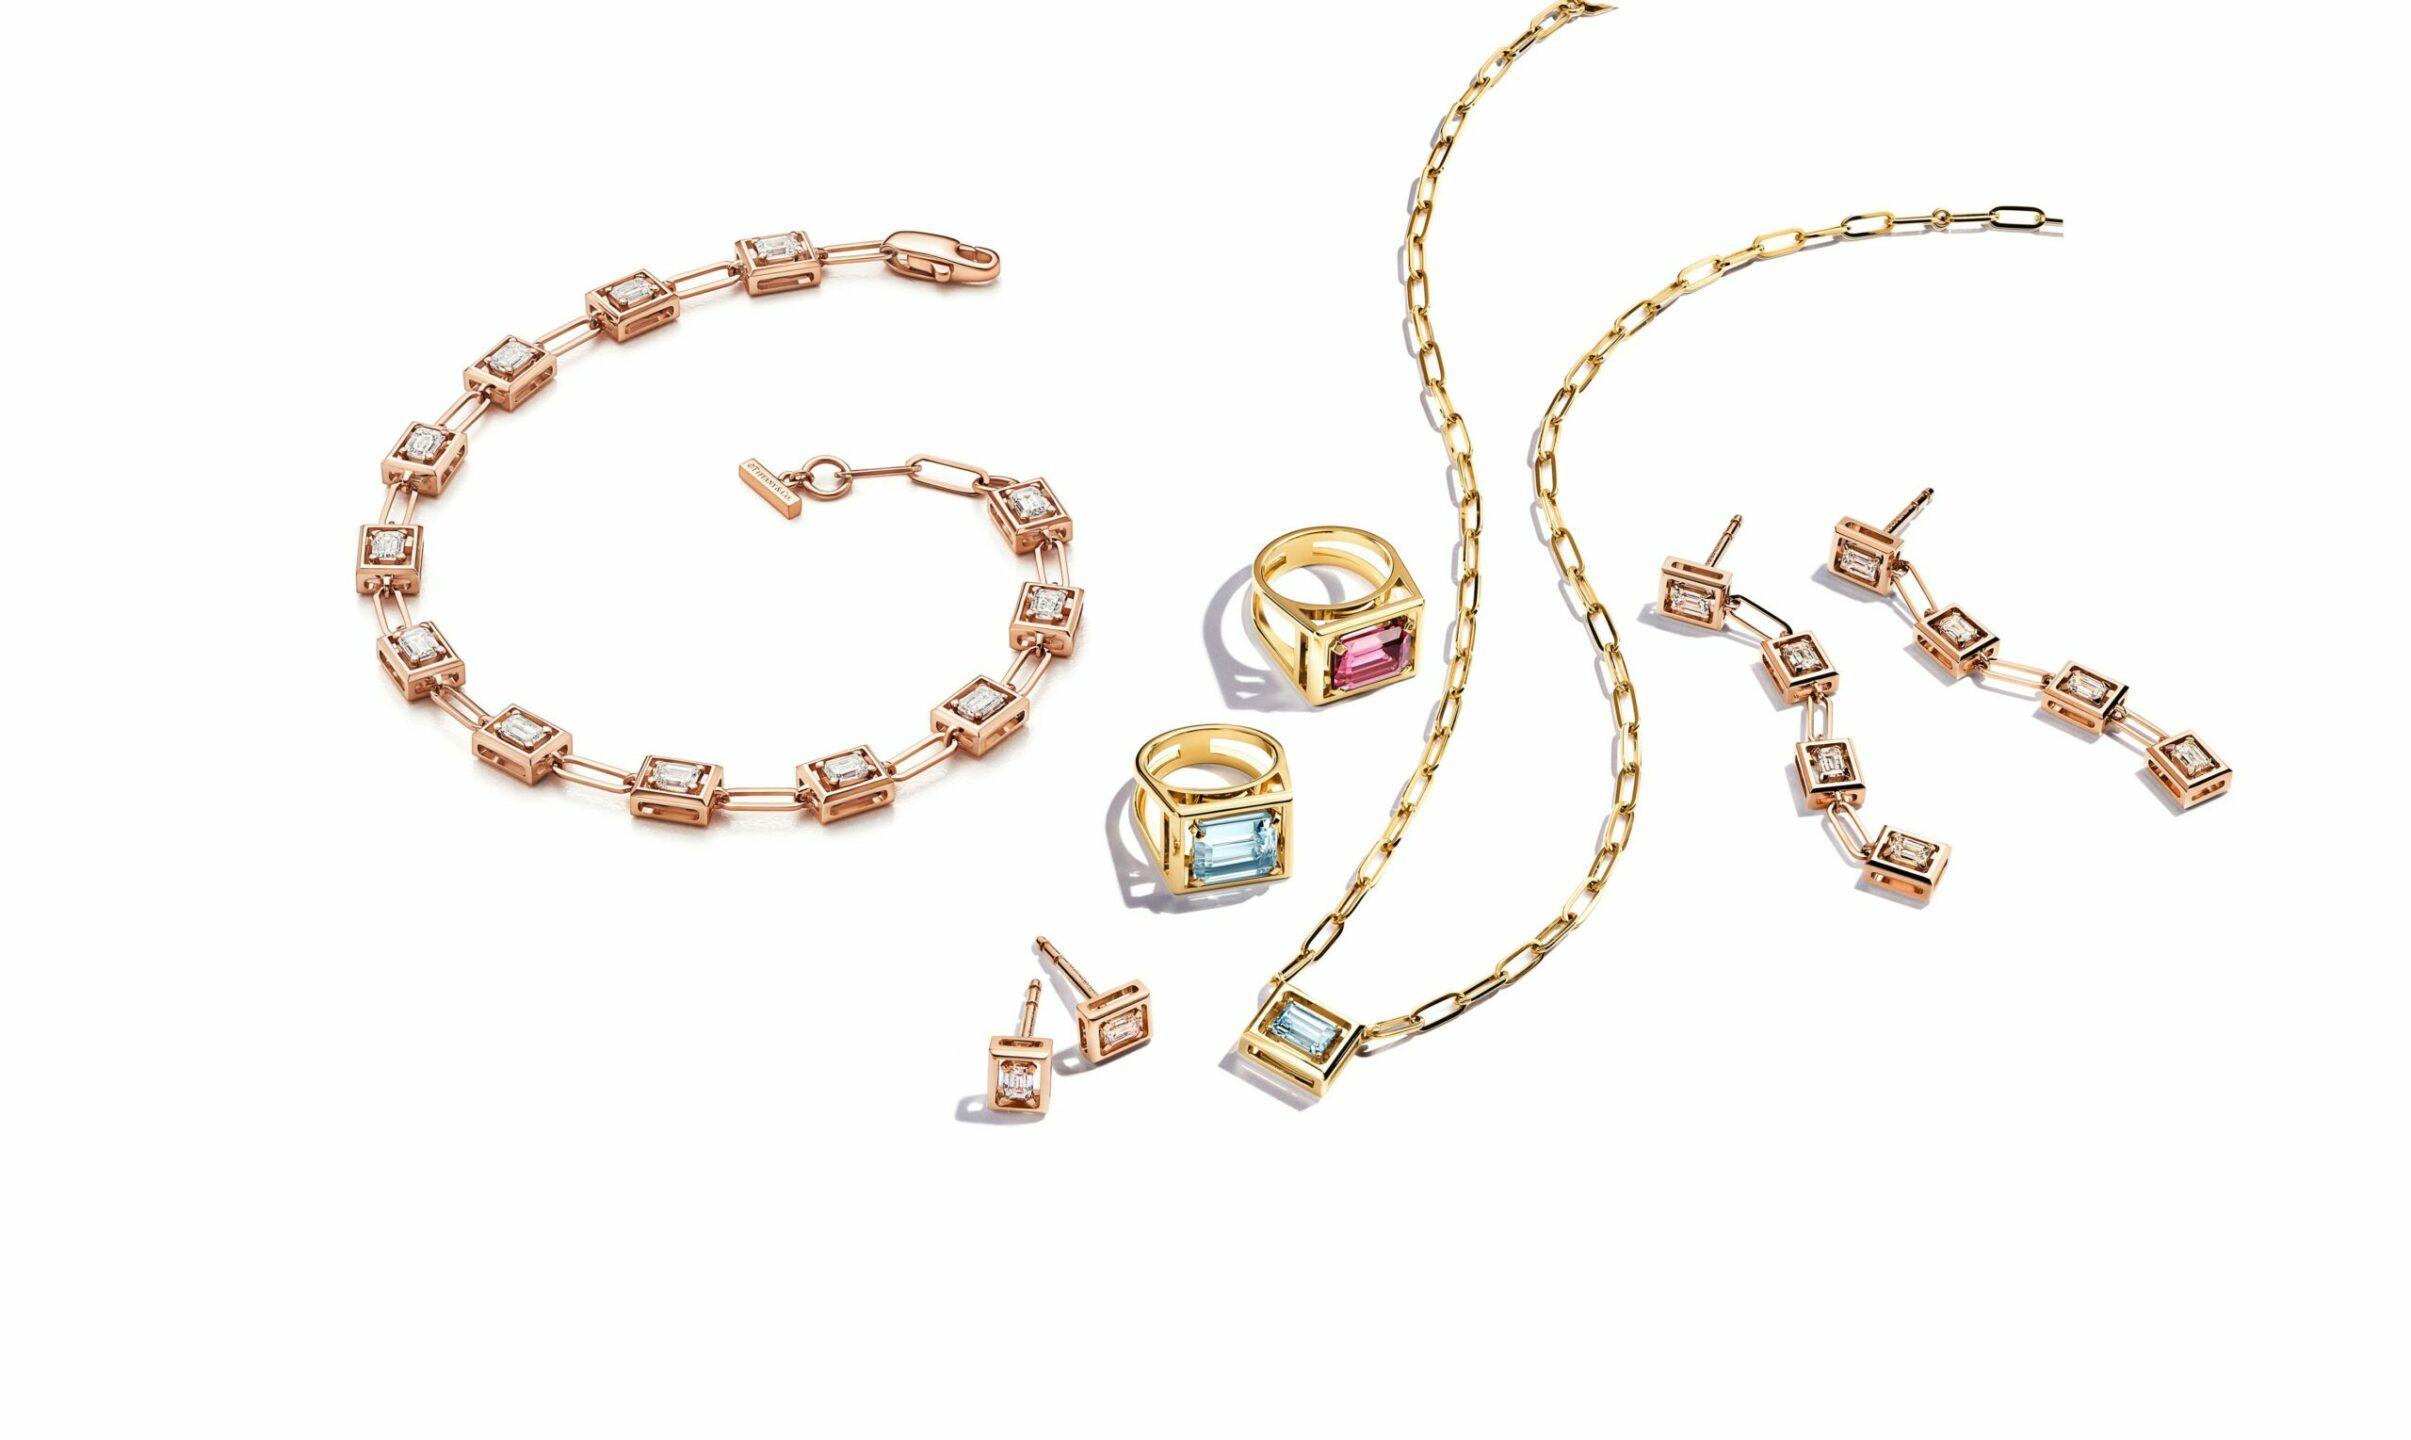 Tiffany Jewel Box Collection